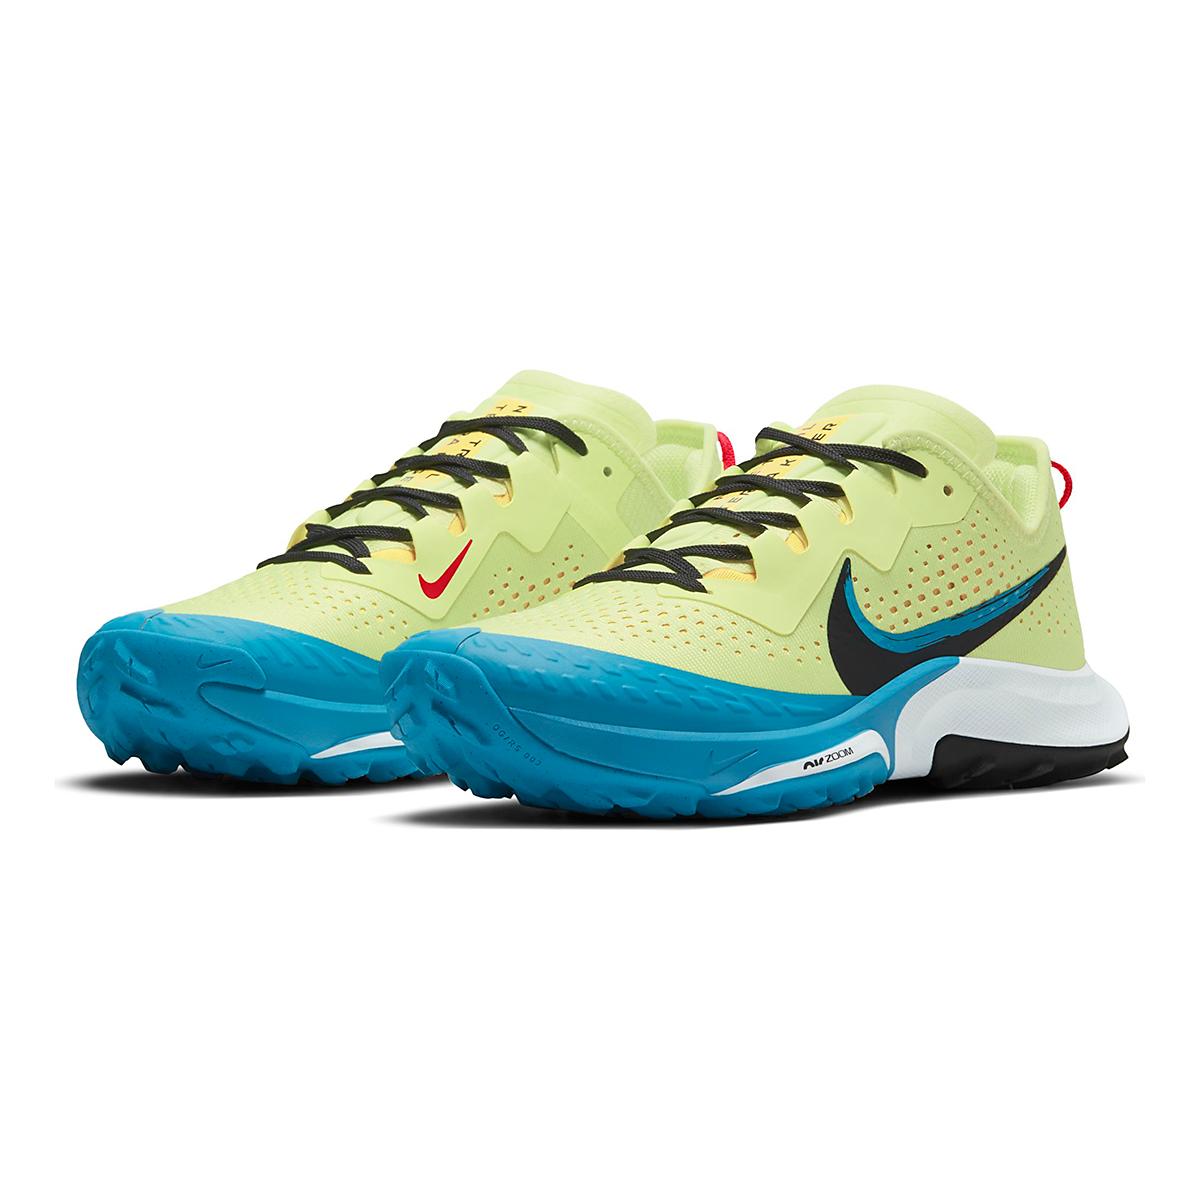 Women's Nike Air Zoom Terra Kiger 7 Trail Running Shoe - Color: Limelight/Off Noir/Laser Blue - Size: 5 - Width: Regular, Limelight/Off Noir/Laser Blue, large, image 3